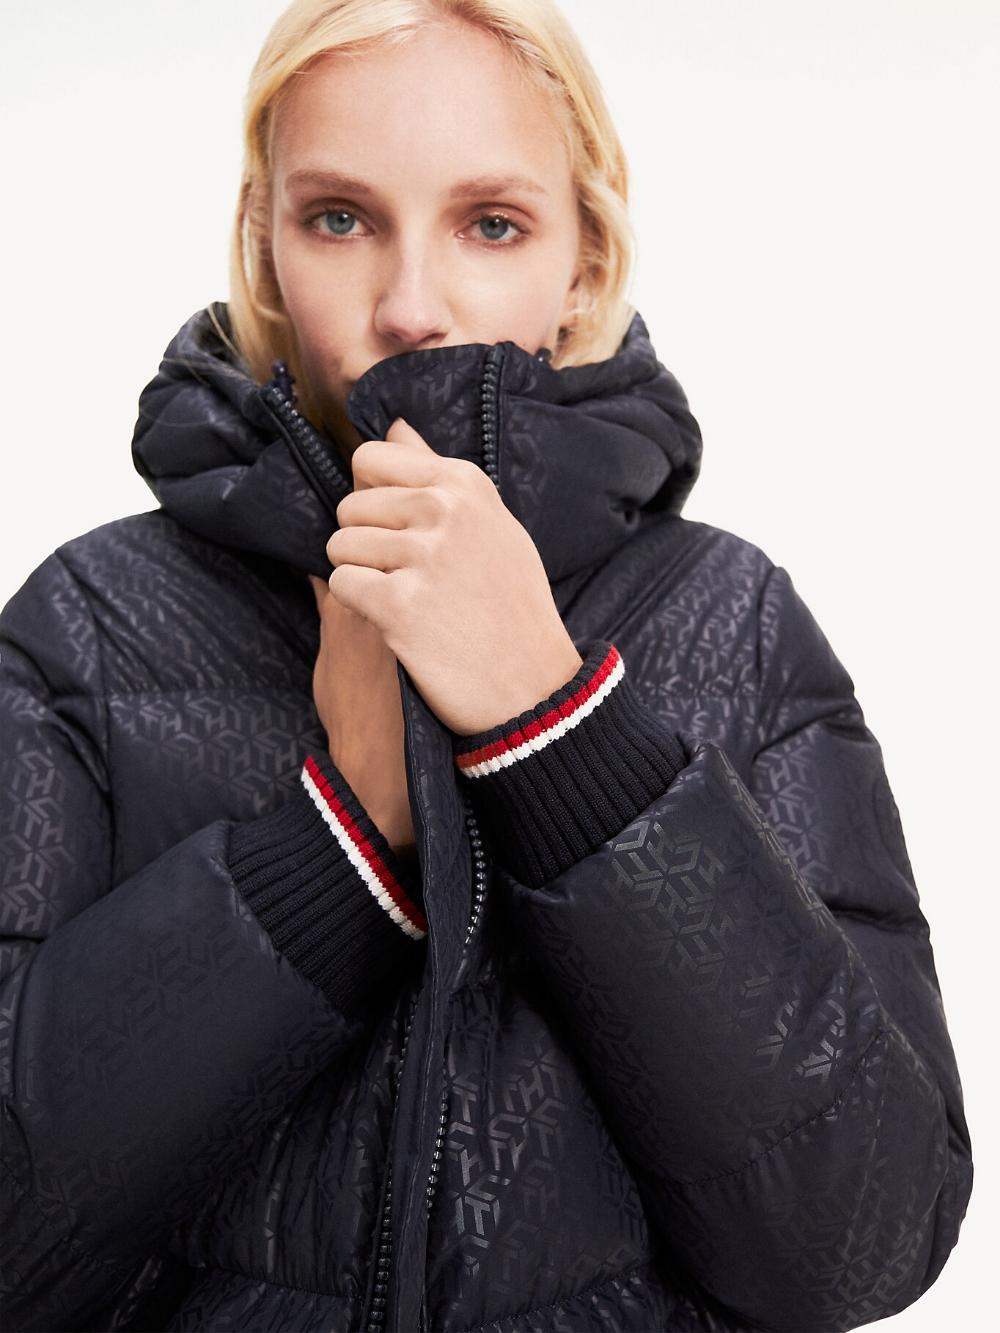 Monogram Print Long Padded Coat Blue Tommy Hilfiger Women S Coats Jackets Outerwear Jackets Tommy [ 1333 x 1000 Pixel ]